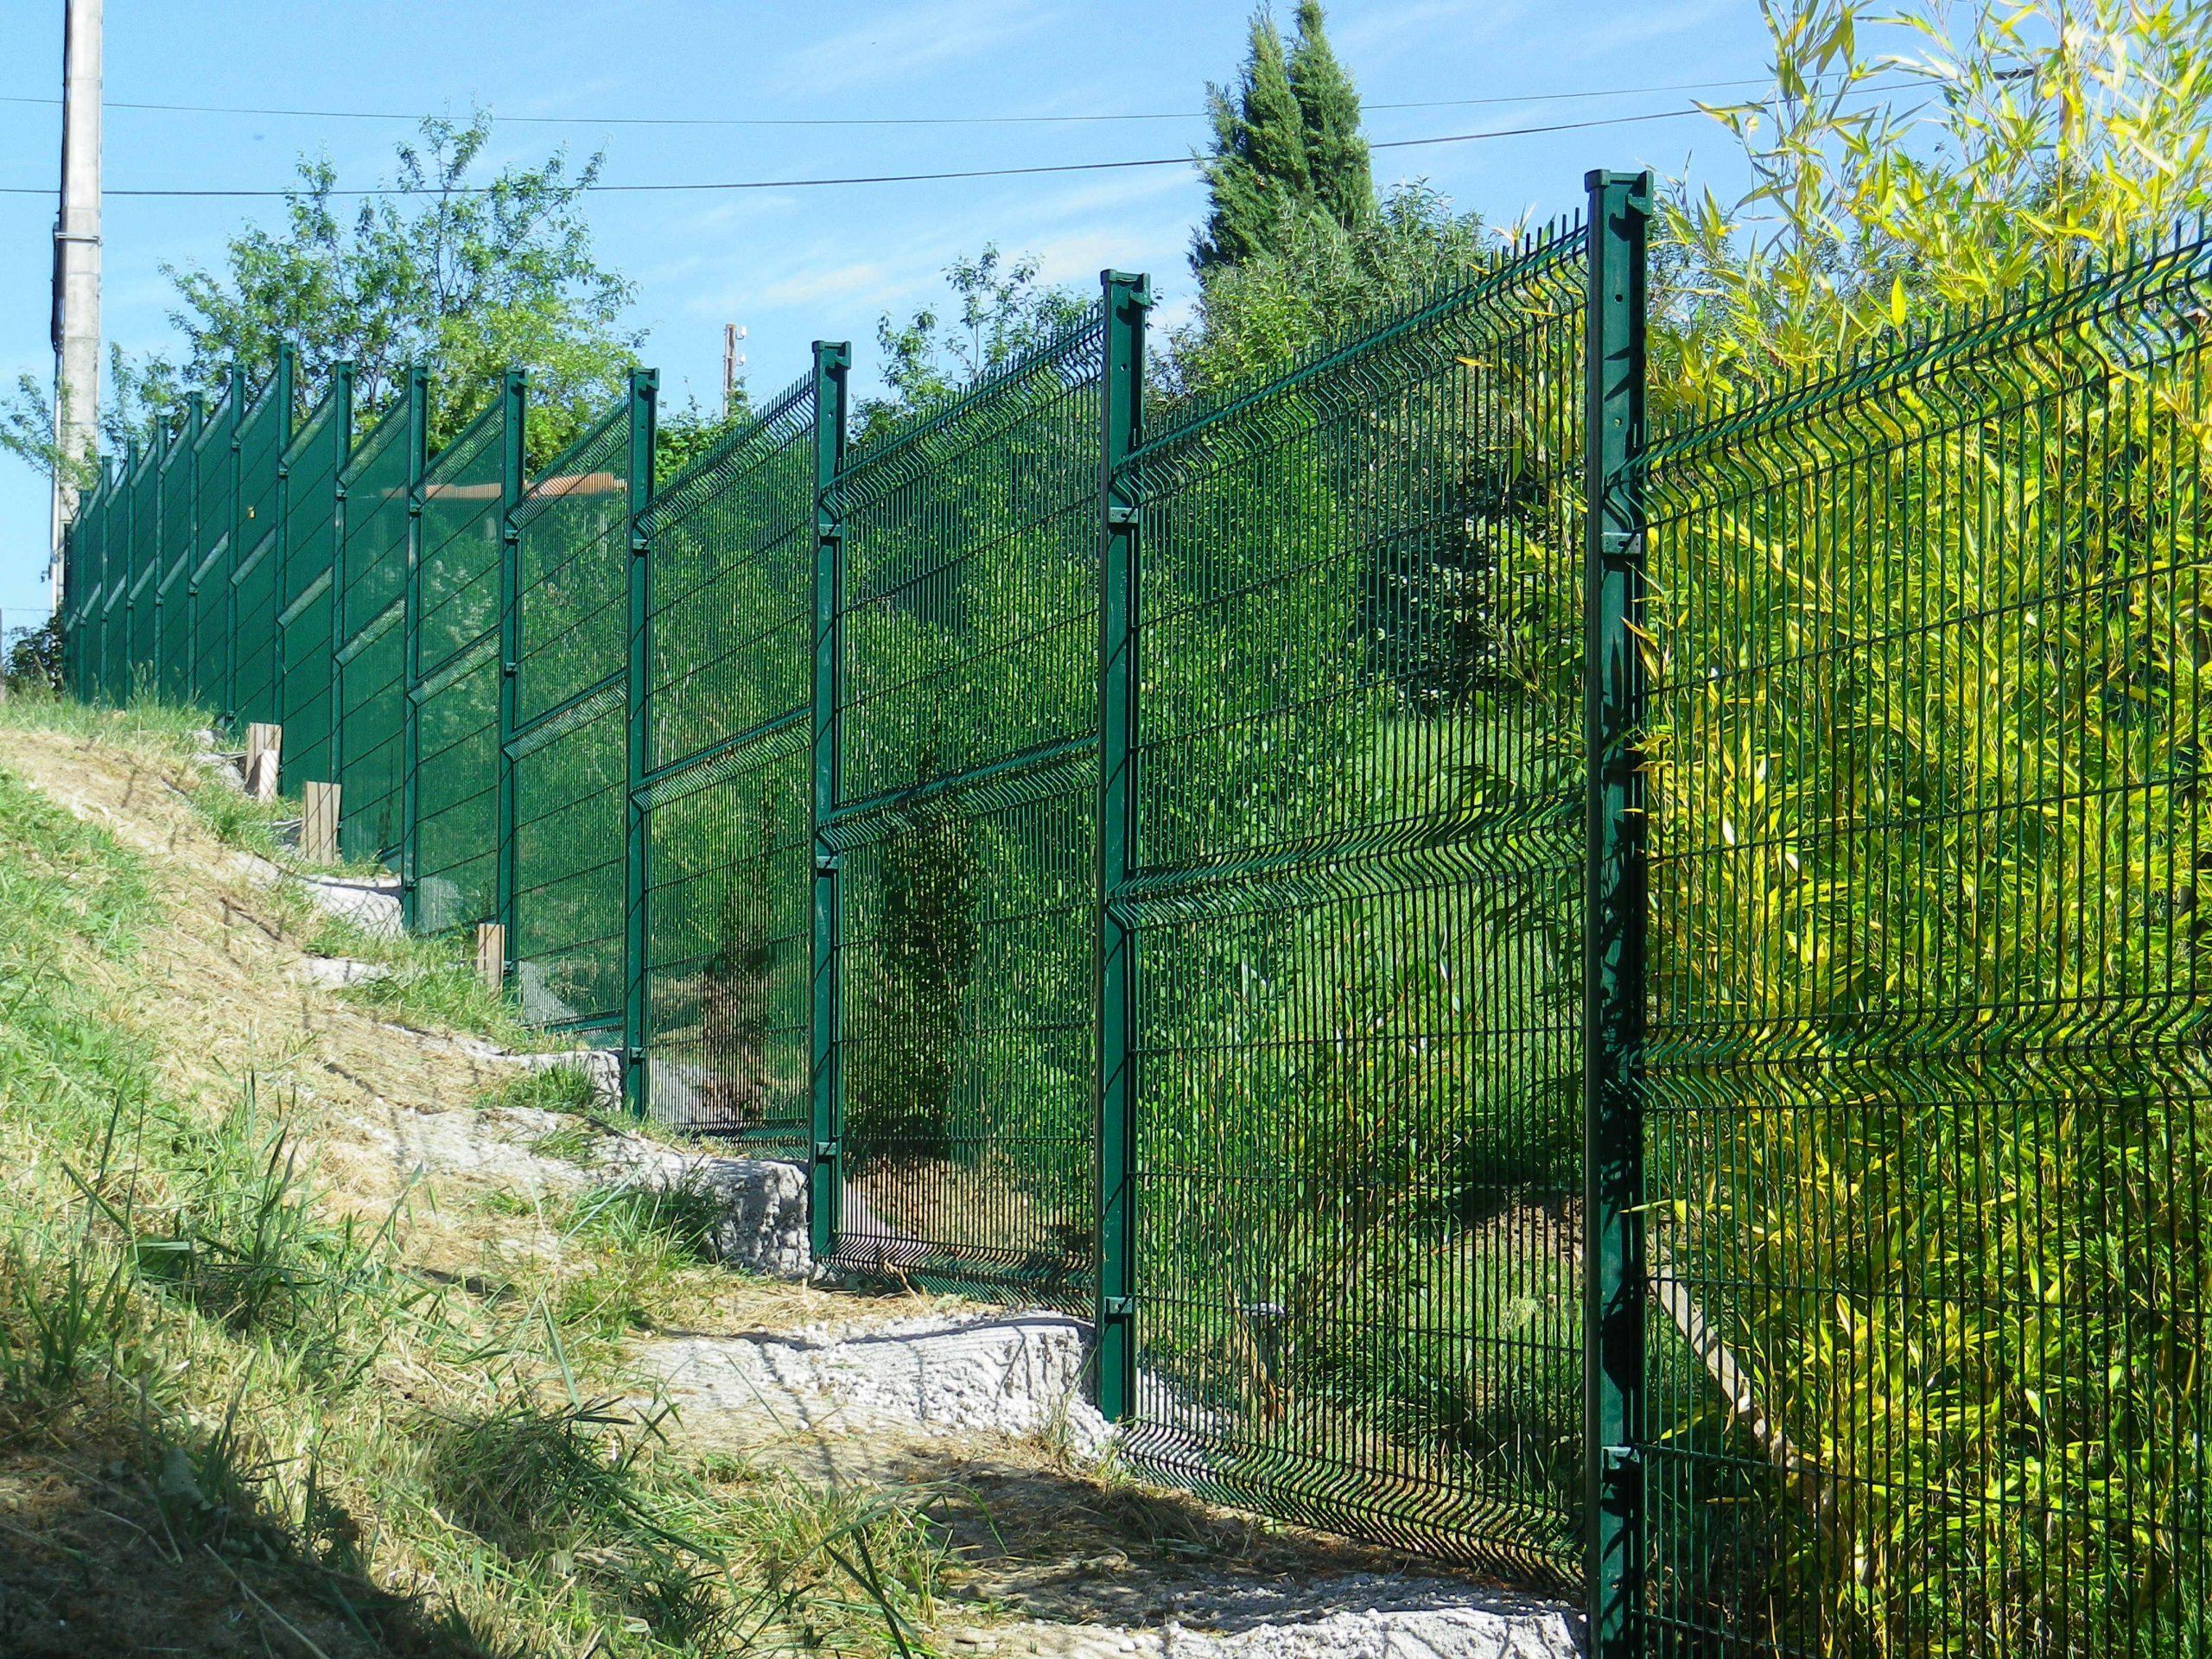 Clôture Rigide En Pente | Amenagement Jardin En Pente ... destiné Grillage De Jardin Rigide